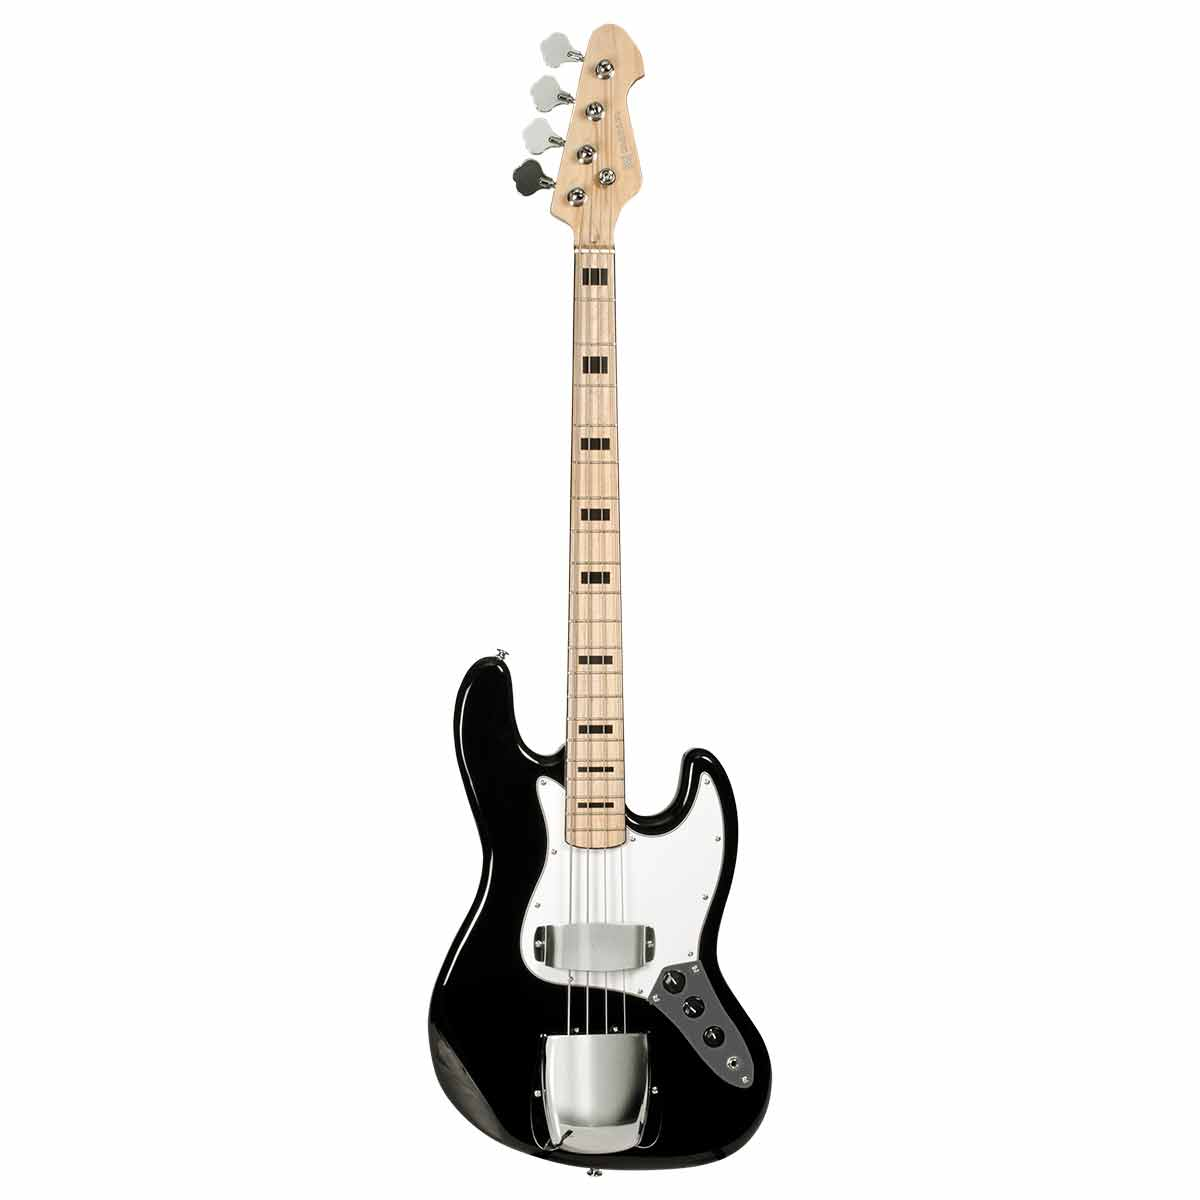 Contrabaixo 4 Cordas Passivo Jazz Bass BM675 BK Preto - Michael